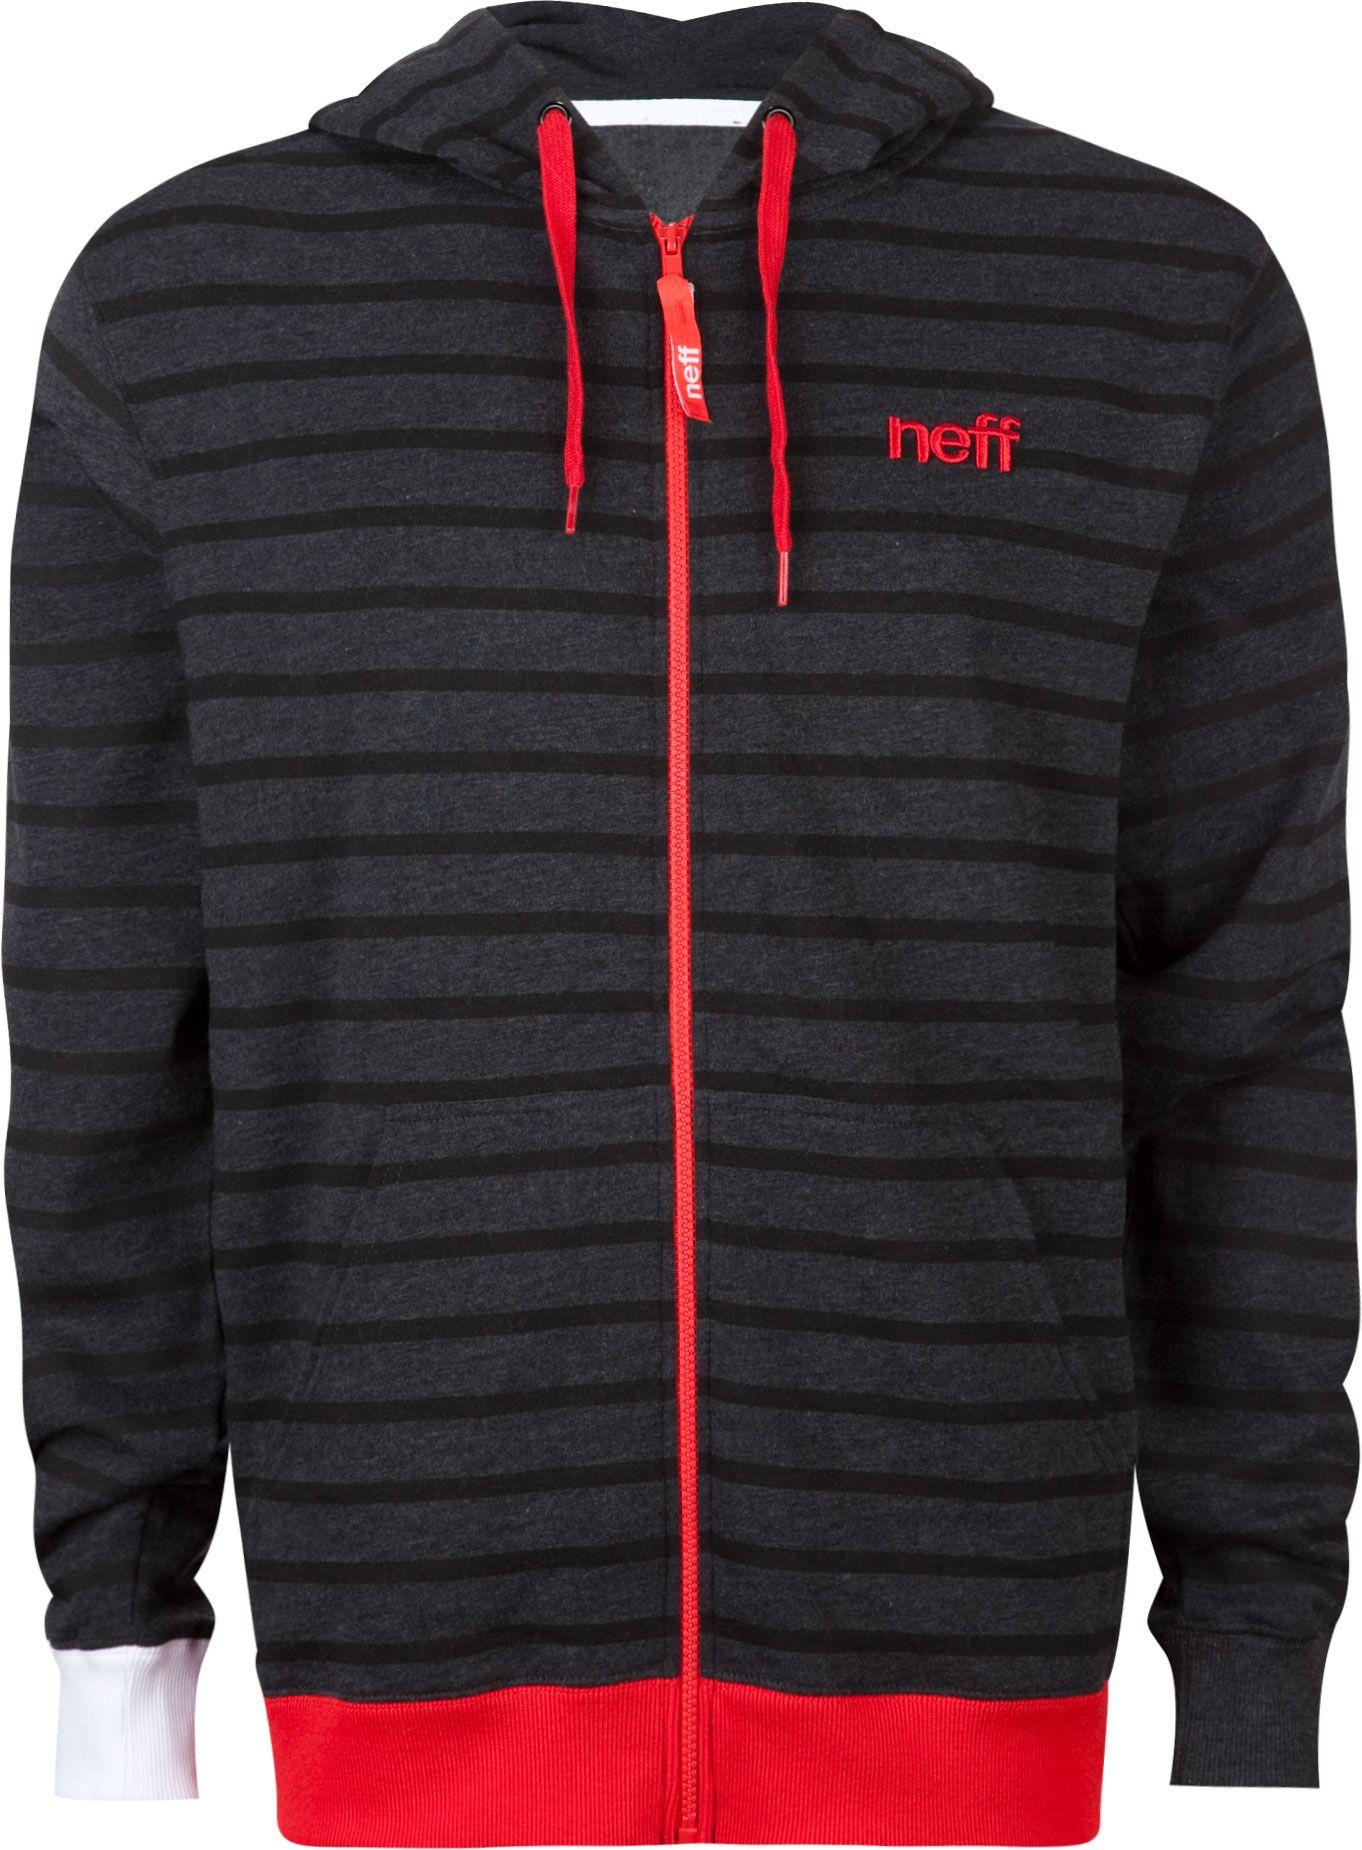 Neff Men/'s New World Pullover Hoodie Black Hooded Sweatshirt Urban Clothing